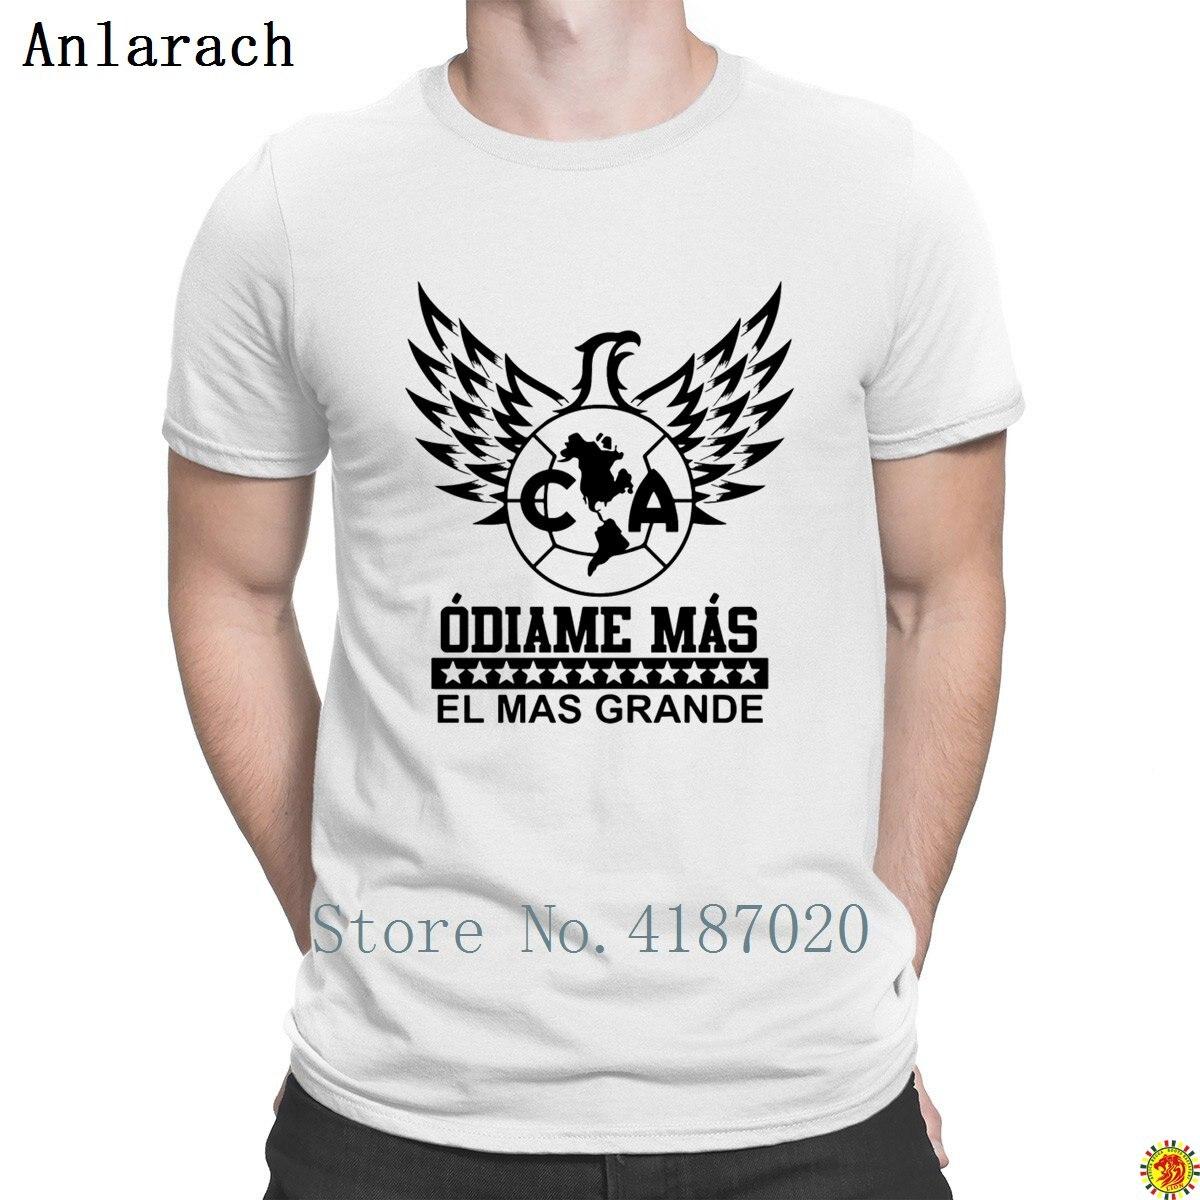 02993e467c7 Club America Mexico Aguilas Camiseta Jersey Odiame Tshirt Creative Loose  Websites Men's Tshirt Summer Kawaii Cotton